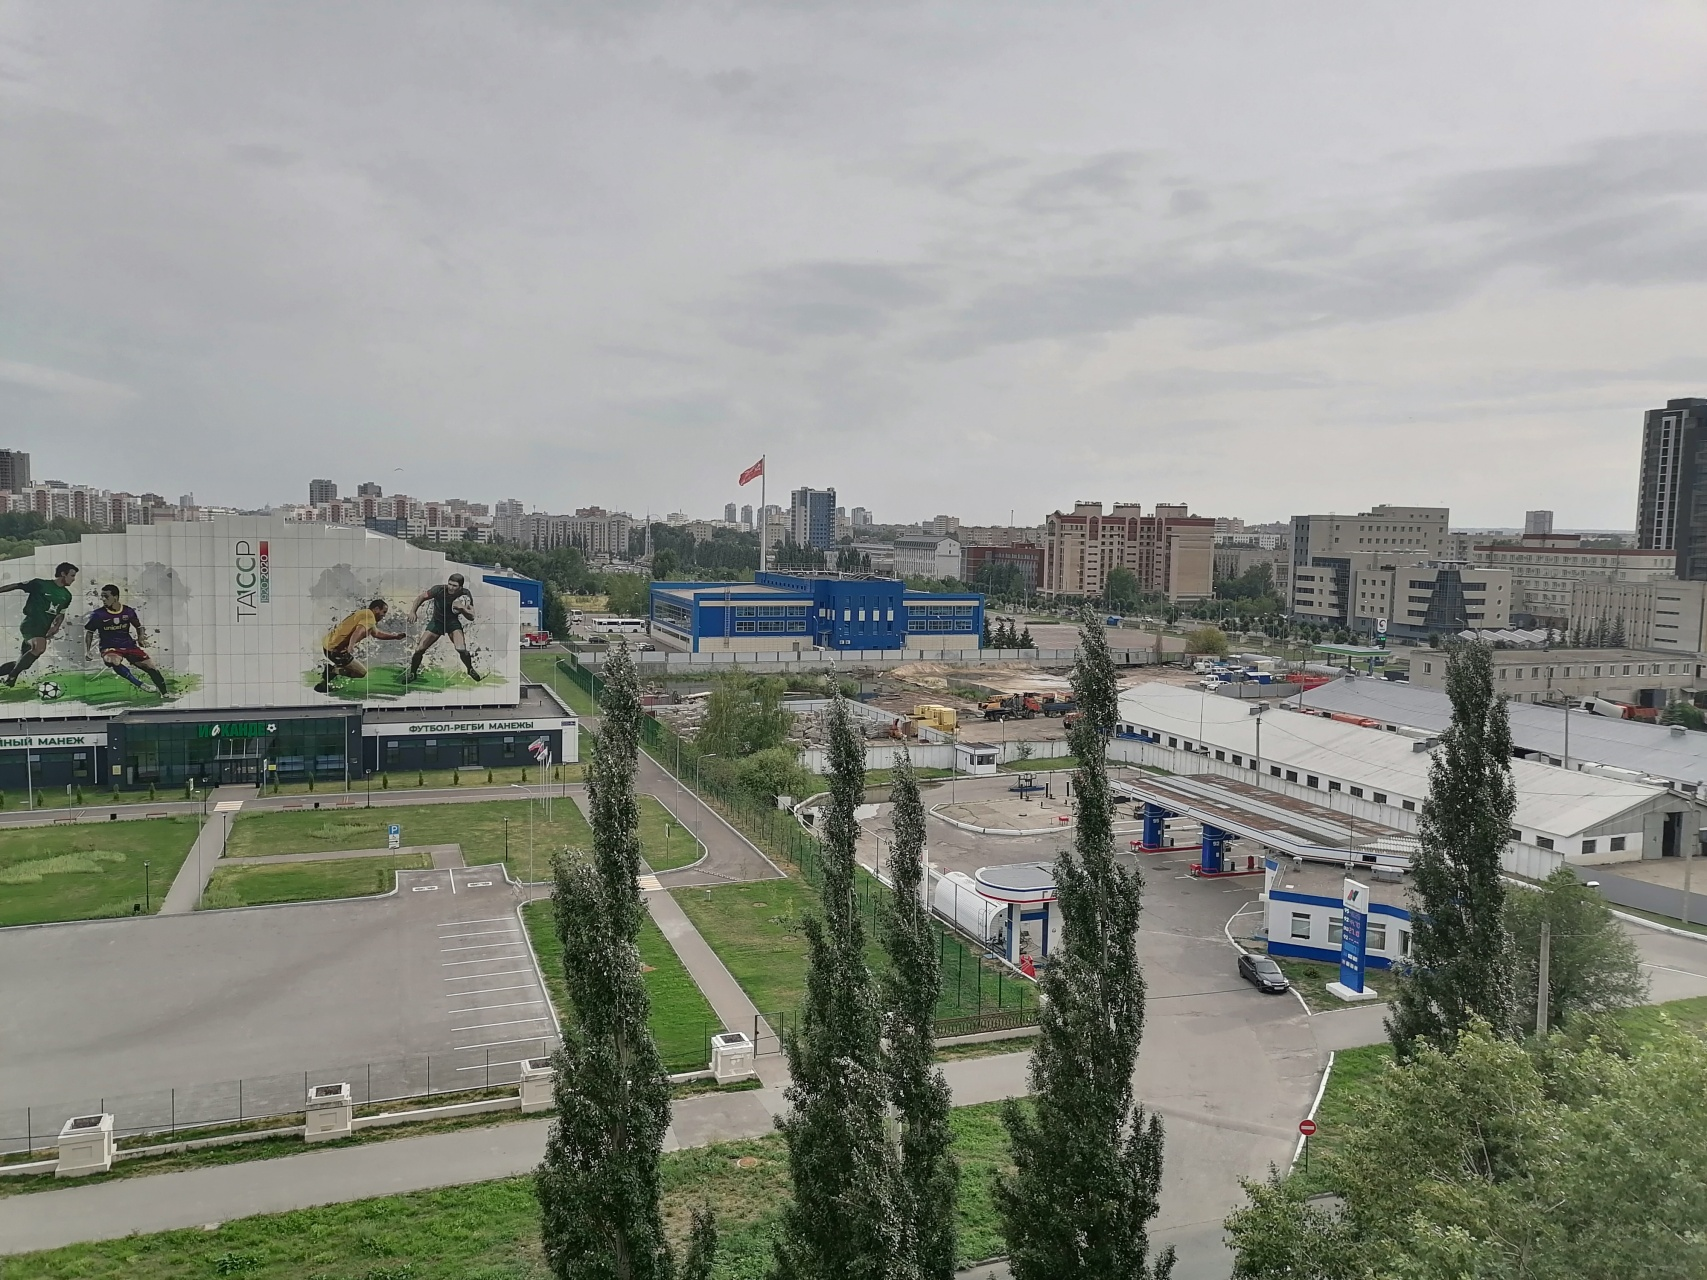 Продам двухкомнатную (2-комн.) квартиру, Маршала Чуйкова ул, 9, Казань г